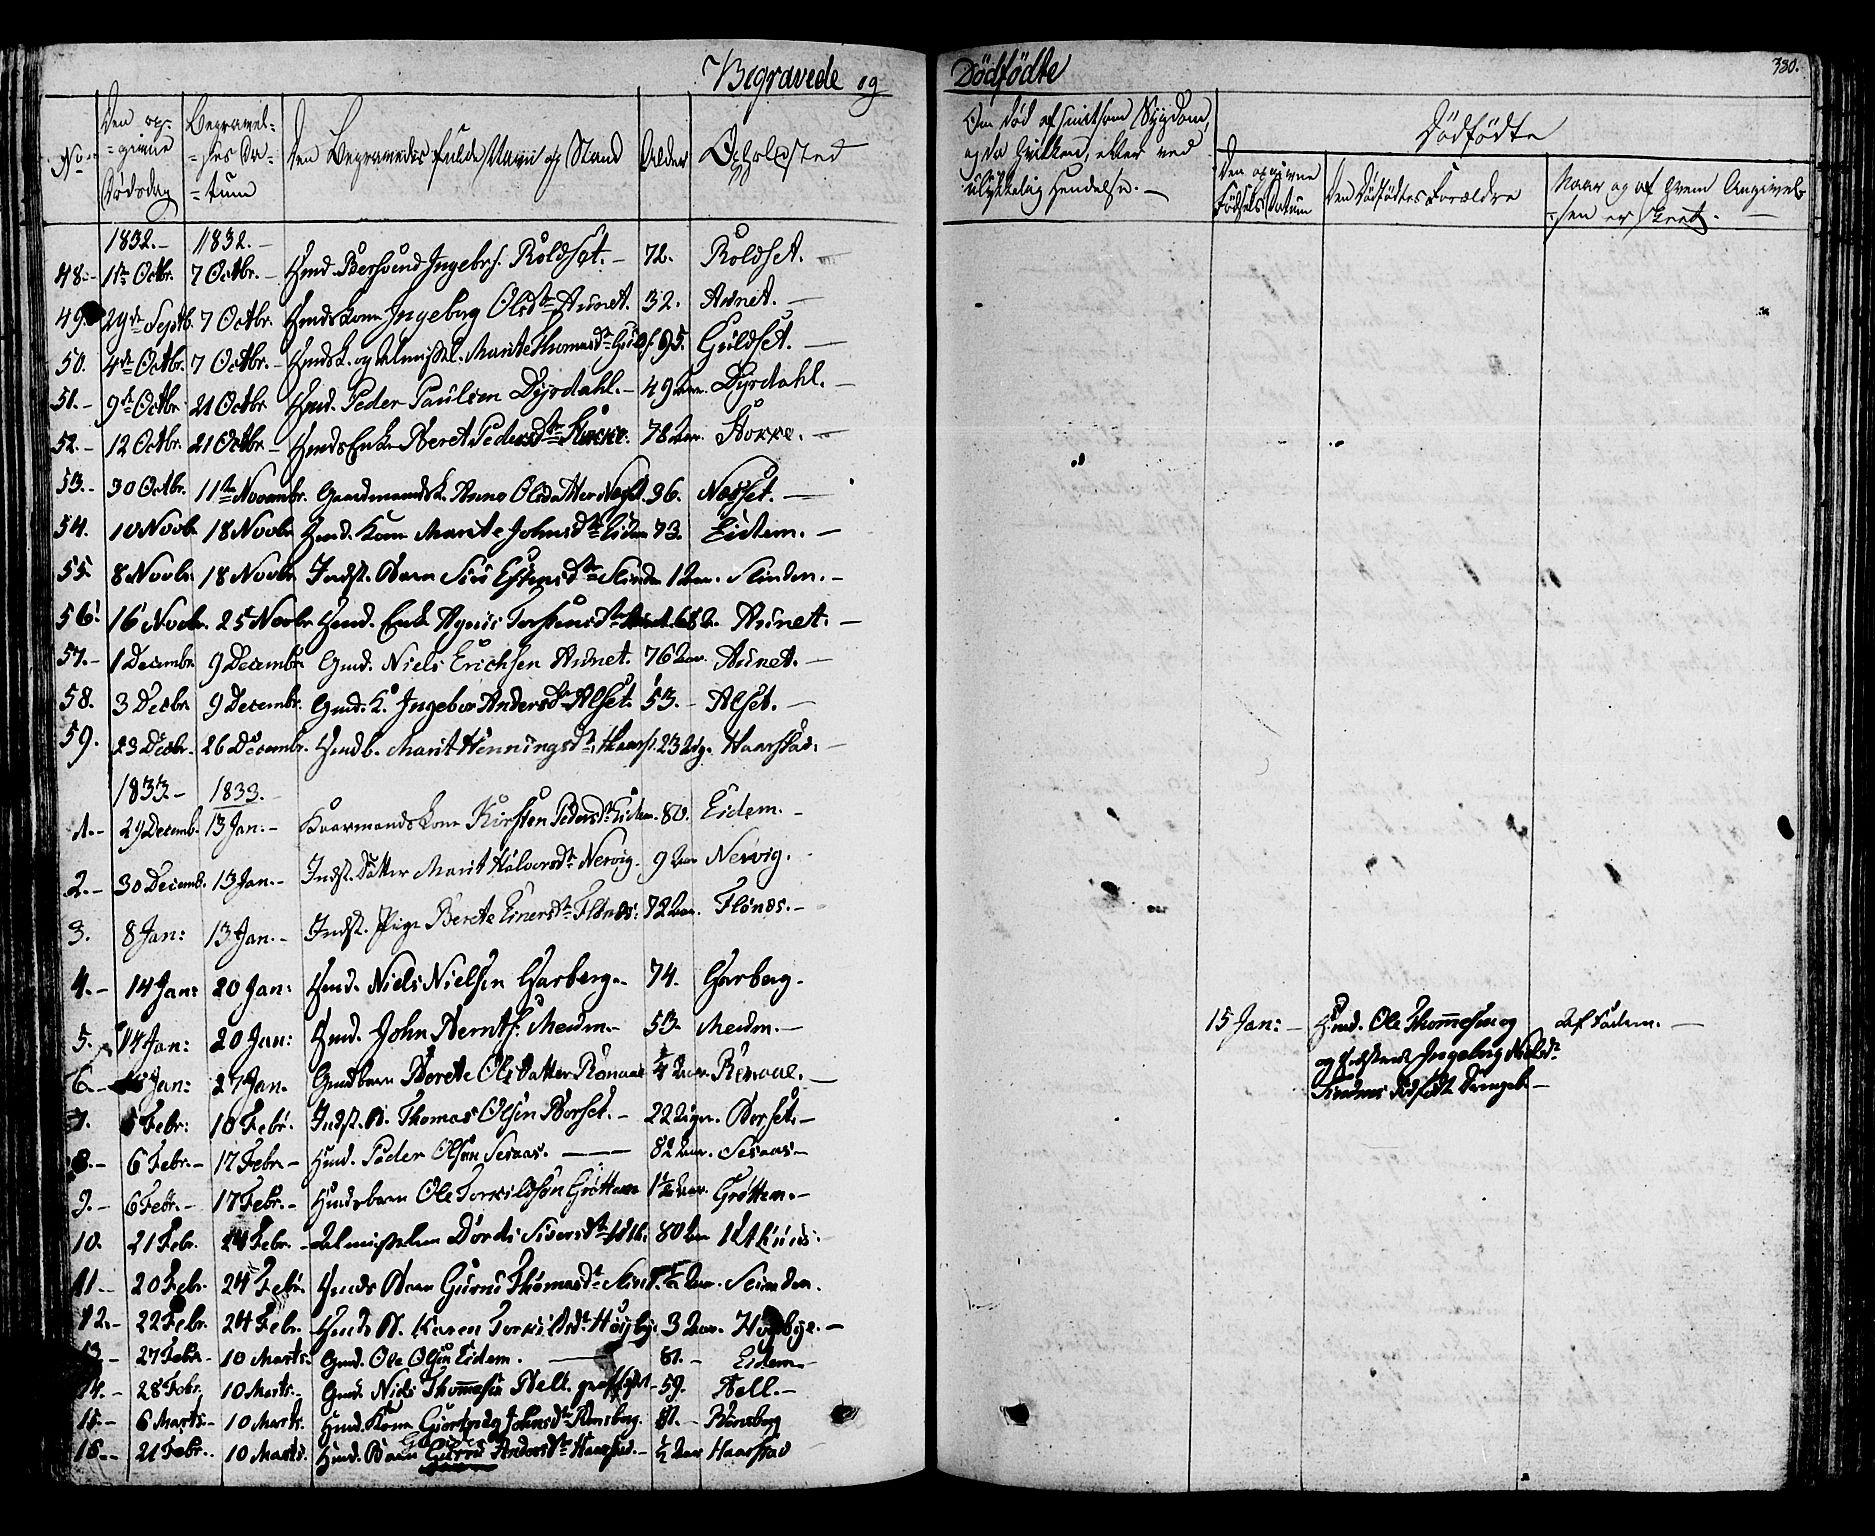 SAT, Ministerialprotokoller, klokkerbøker og fødselsregistre - Sør-Trøndelag, 695/L1143: Parish register (official) no. 695A05 /1, 1824-1842, p. 380